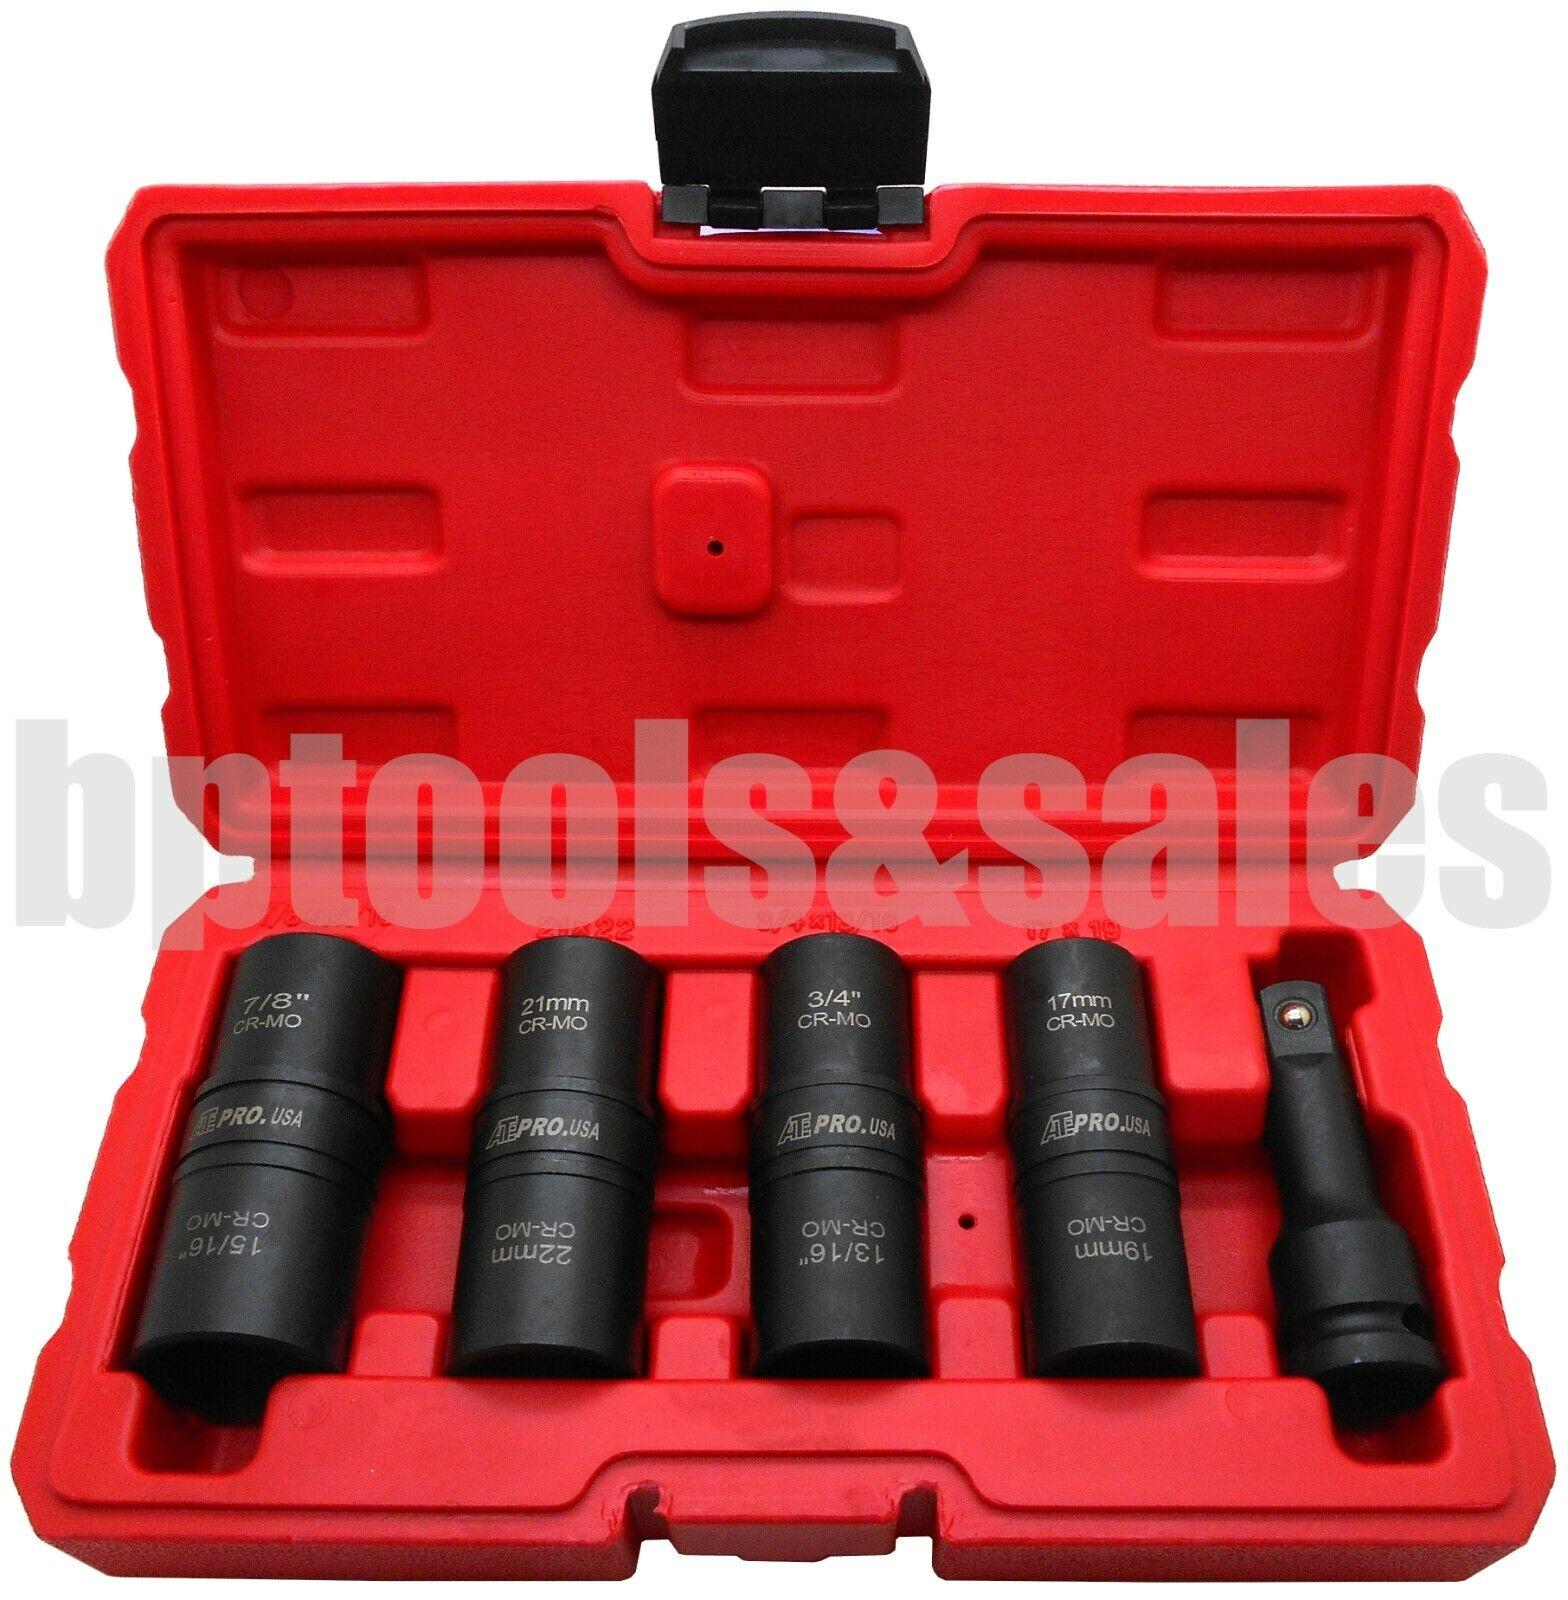 bptools_n_sales 5PC 1/2 DR. THIN WALL FLIP IMPACT SOCKET SET FOR AUTO RIMS TIRES LUG NUTS